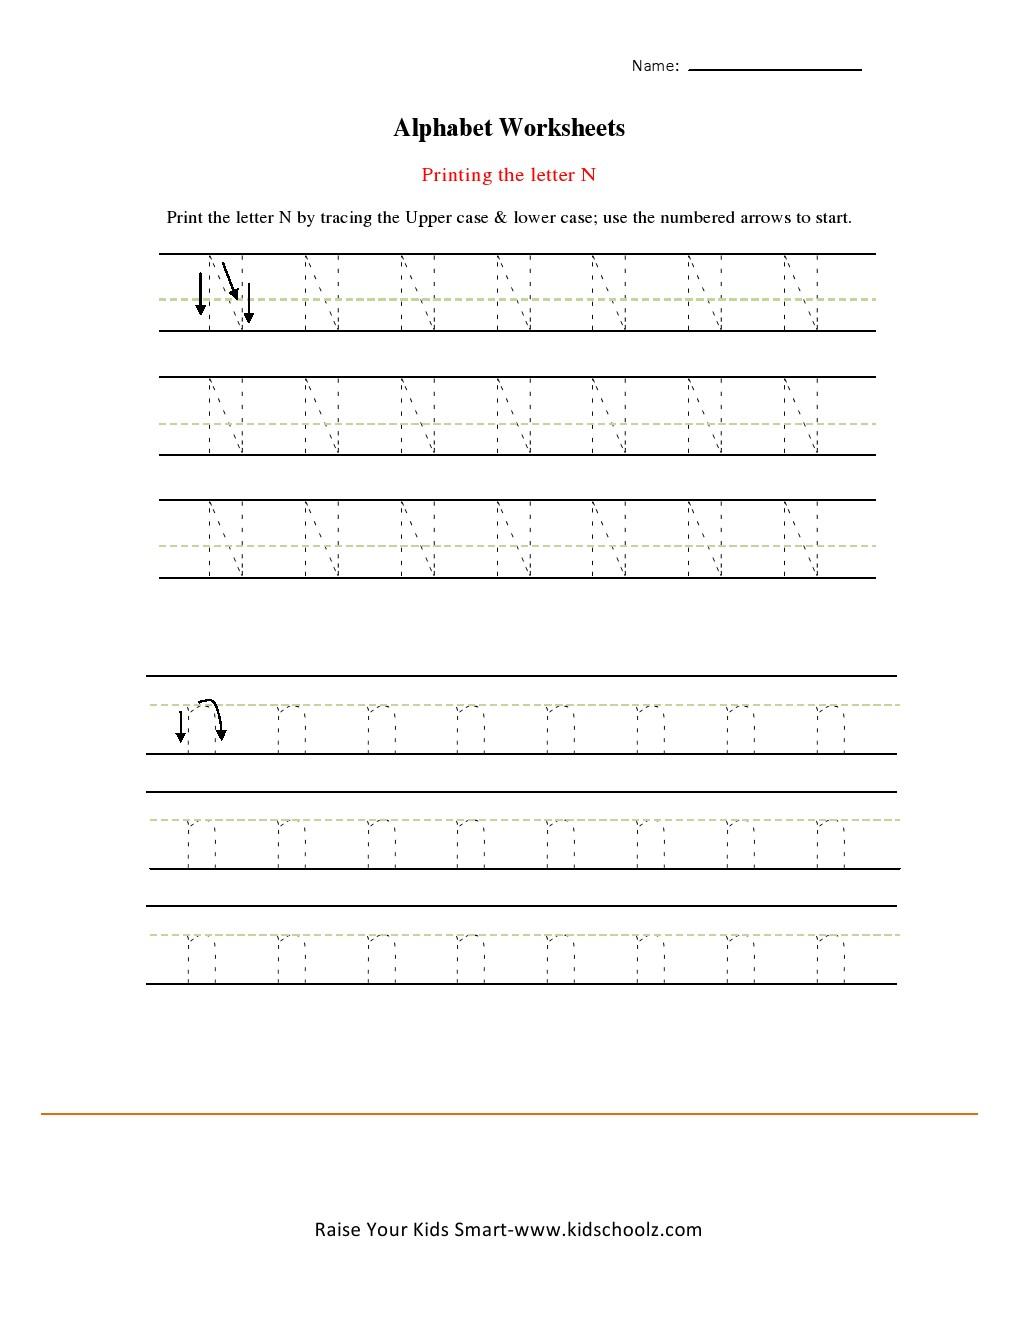 Alphabets Tracing Worksheets - Letter N - KidschoolzKidschoolz